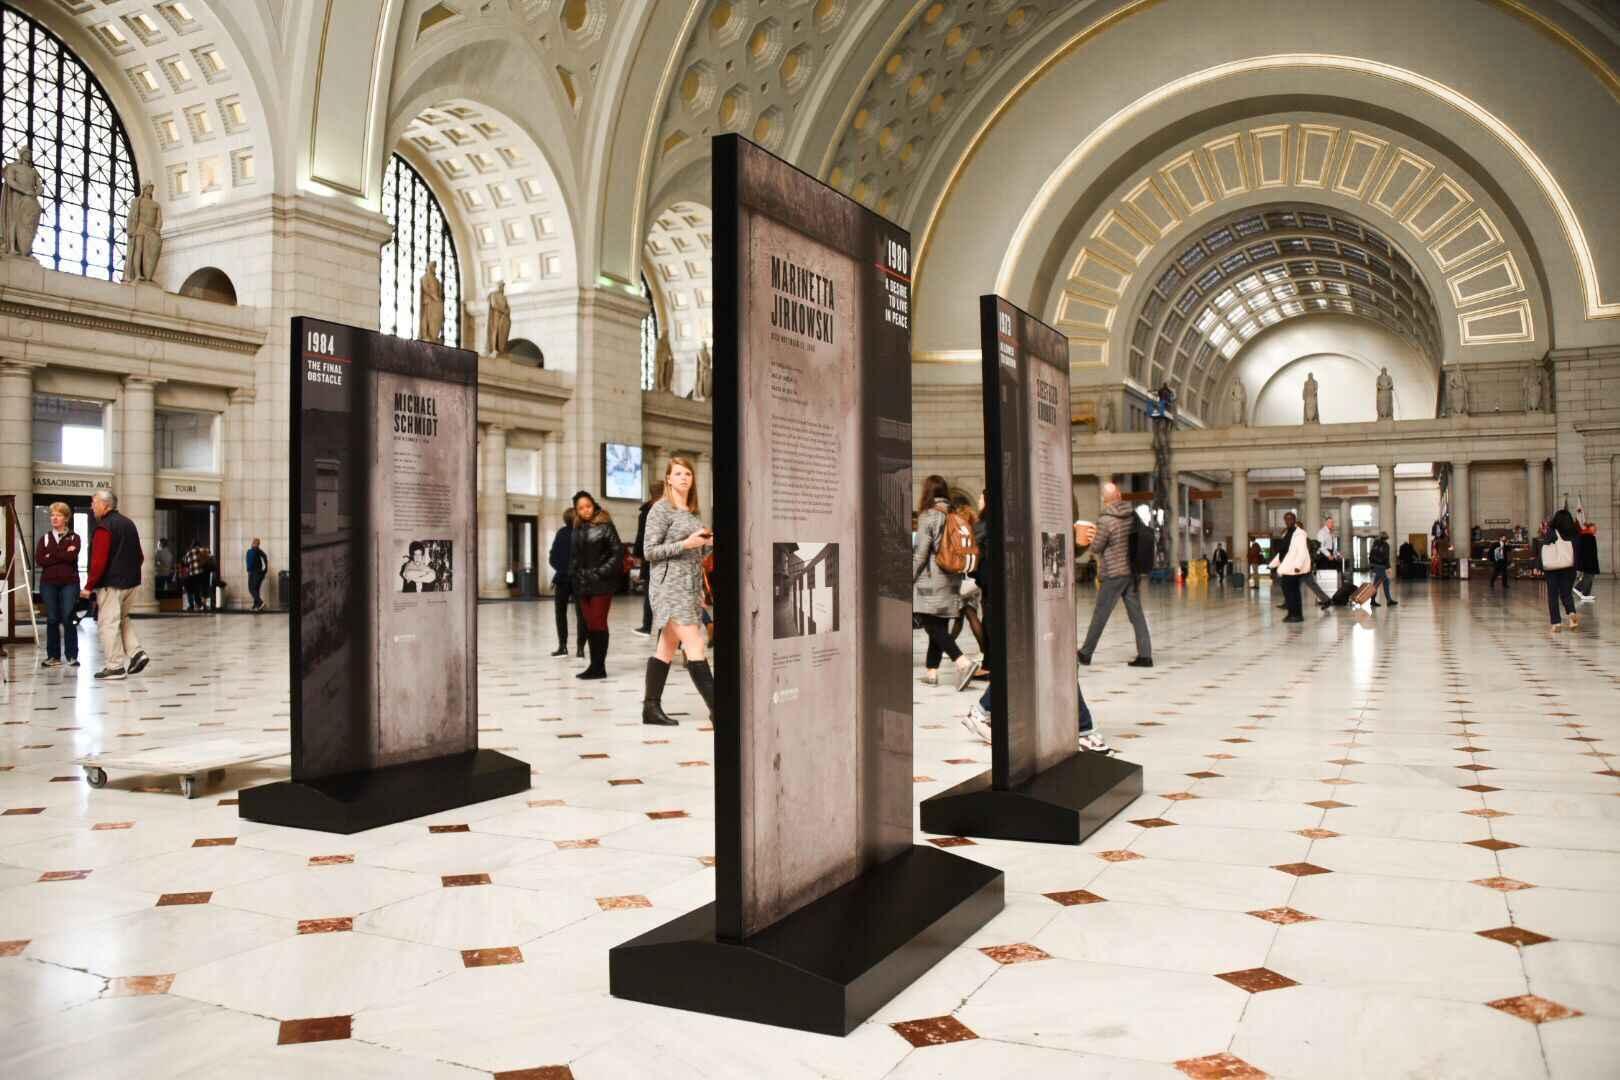 Sponsor VOC's Berlin Wall Exhibit at Union Station image